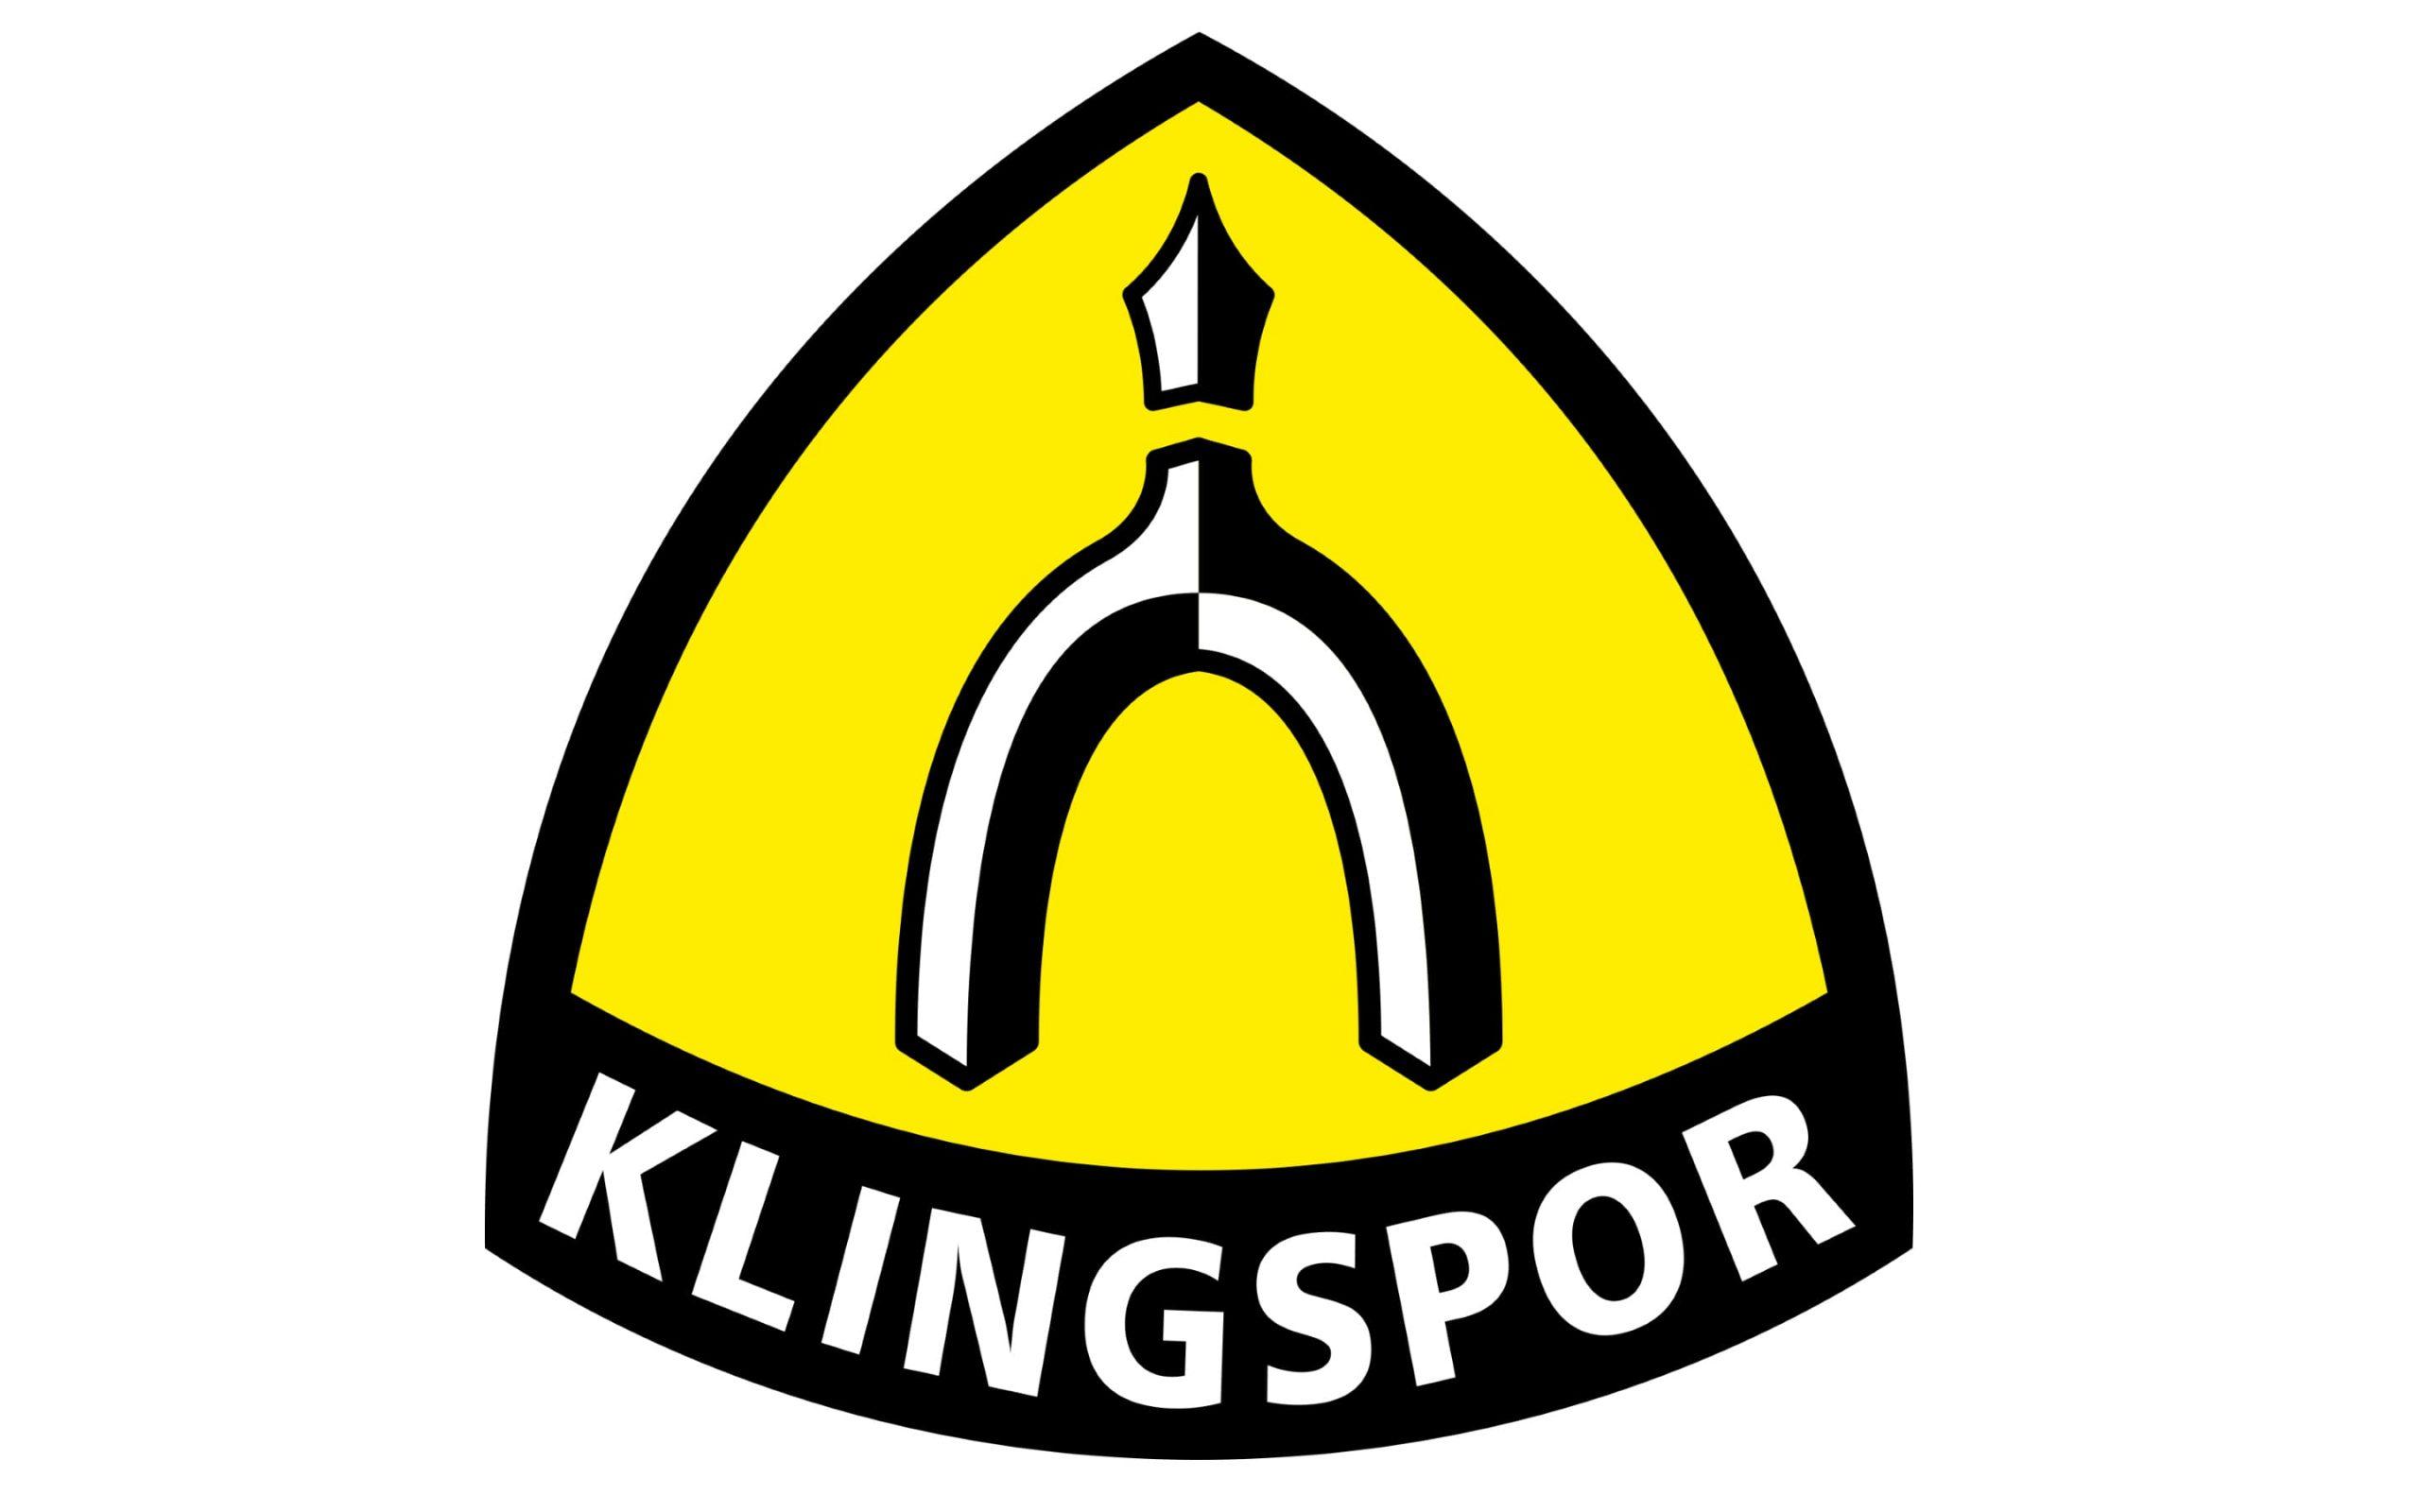 Klingspor-Emblem